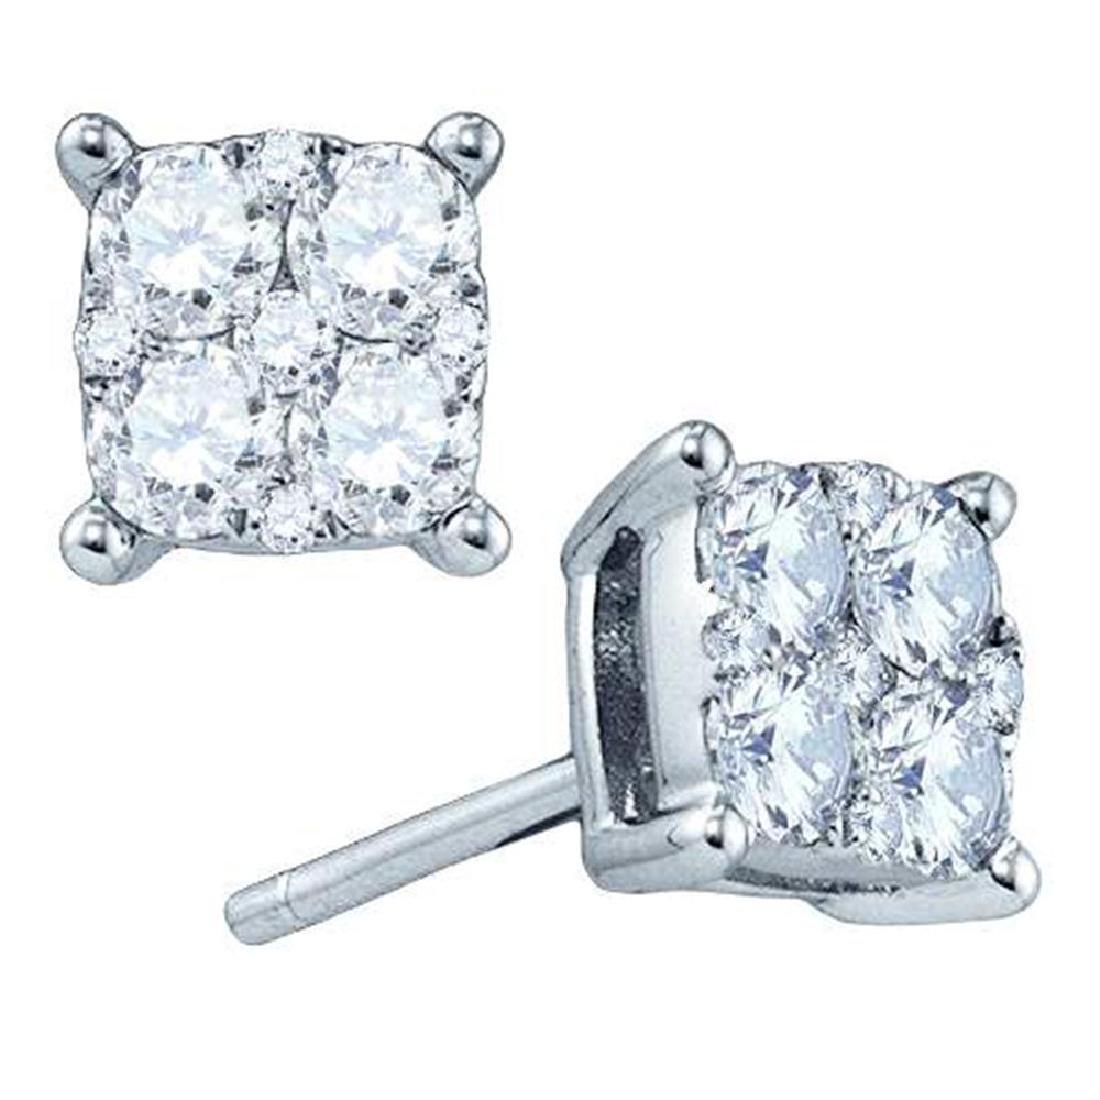 1.55 CTW Diamond Square Cluster Screwback Earrings 18KT